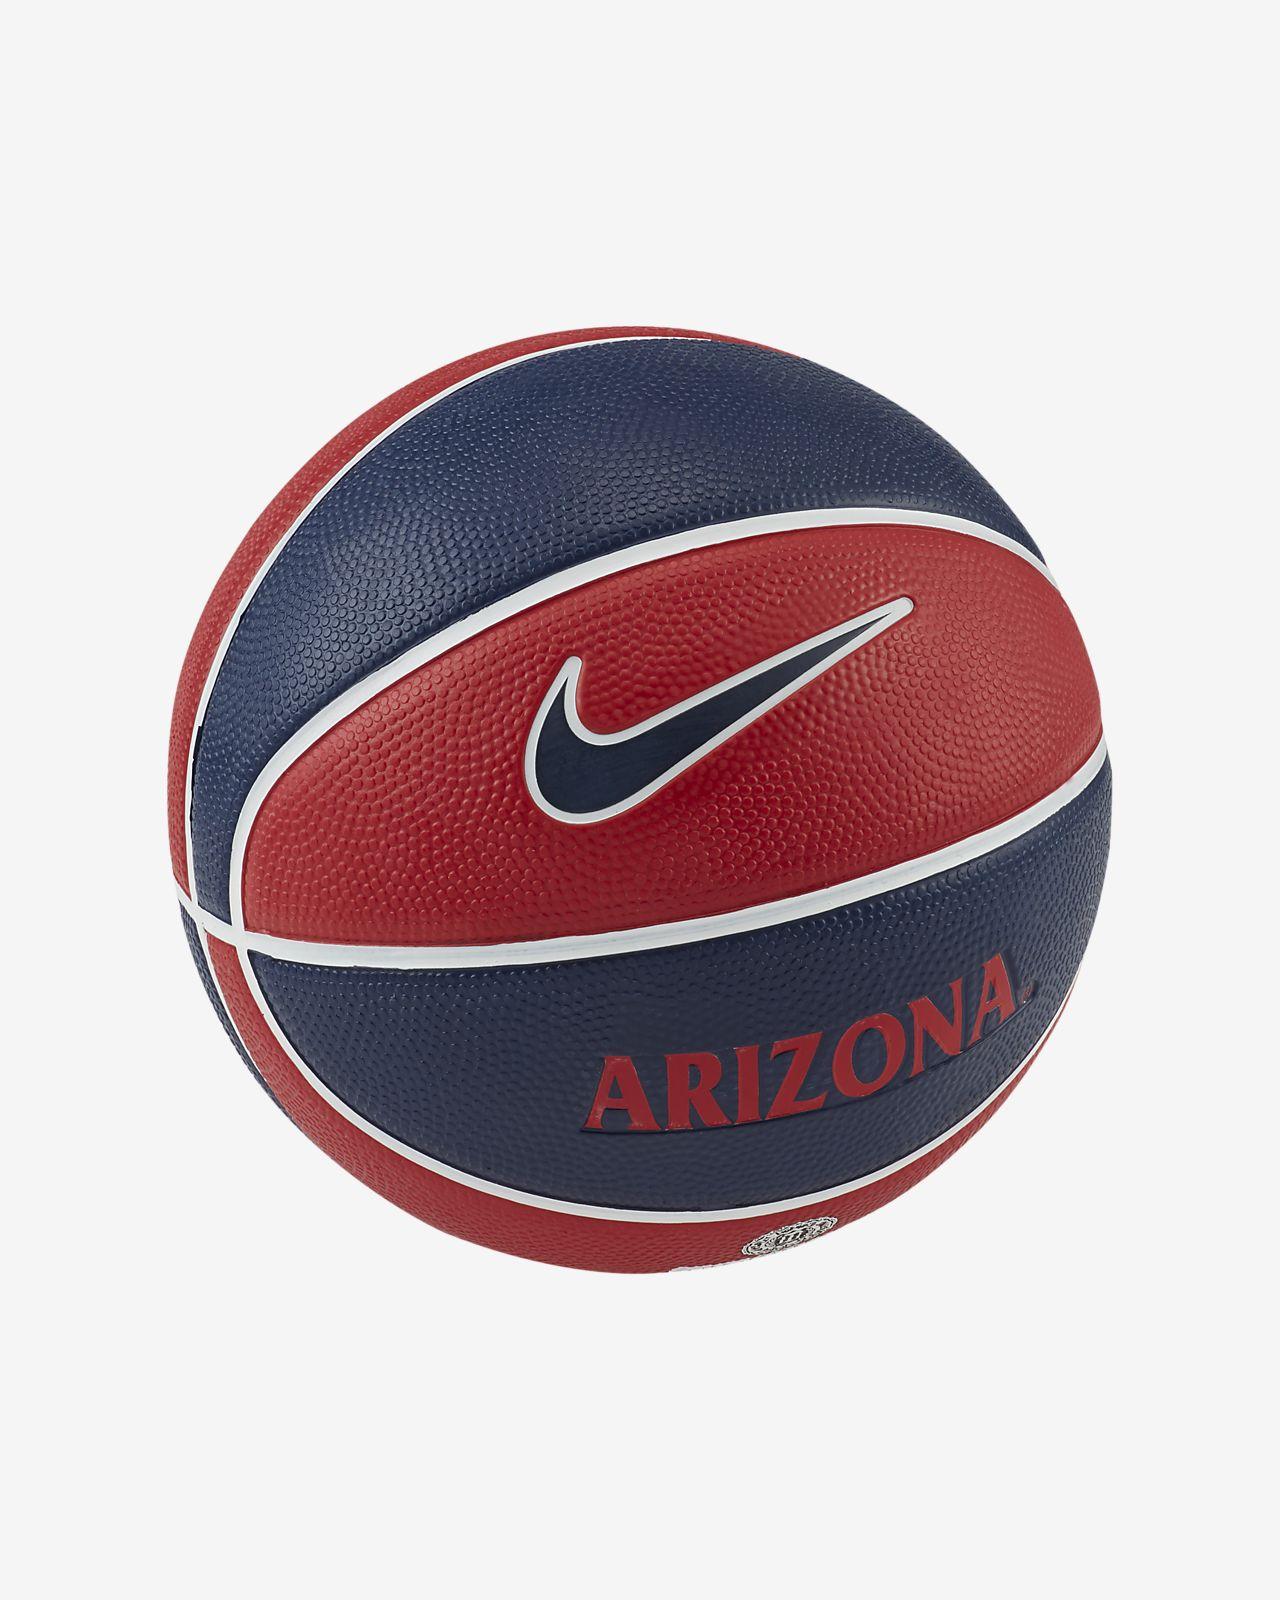 Nike College Mini (Arizona) Basketball